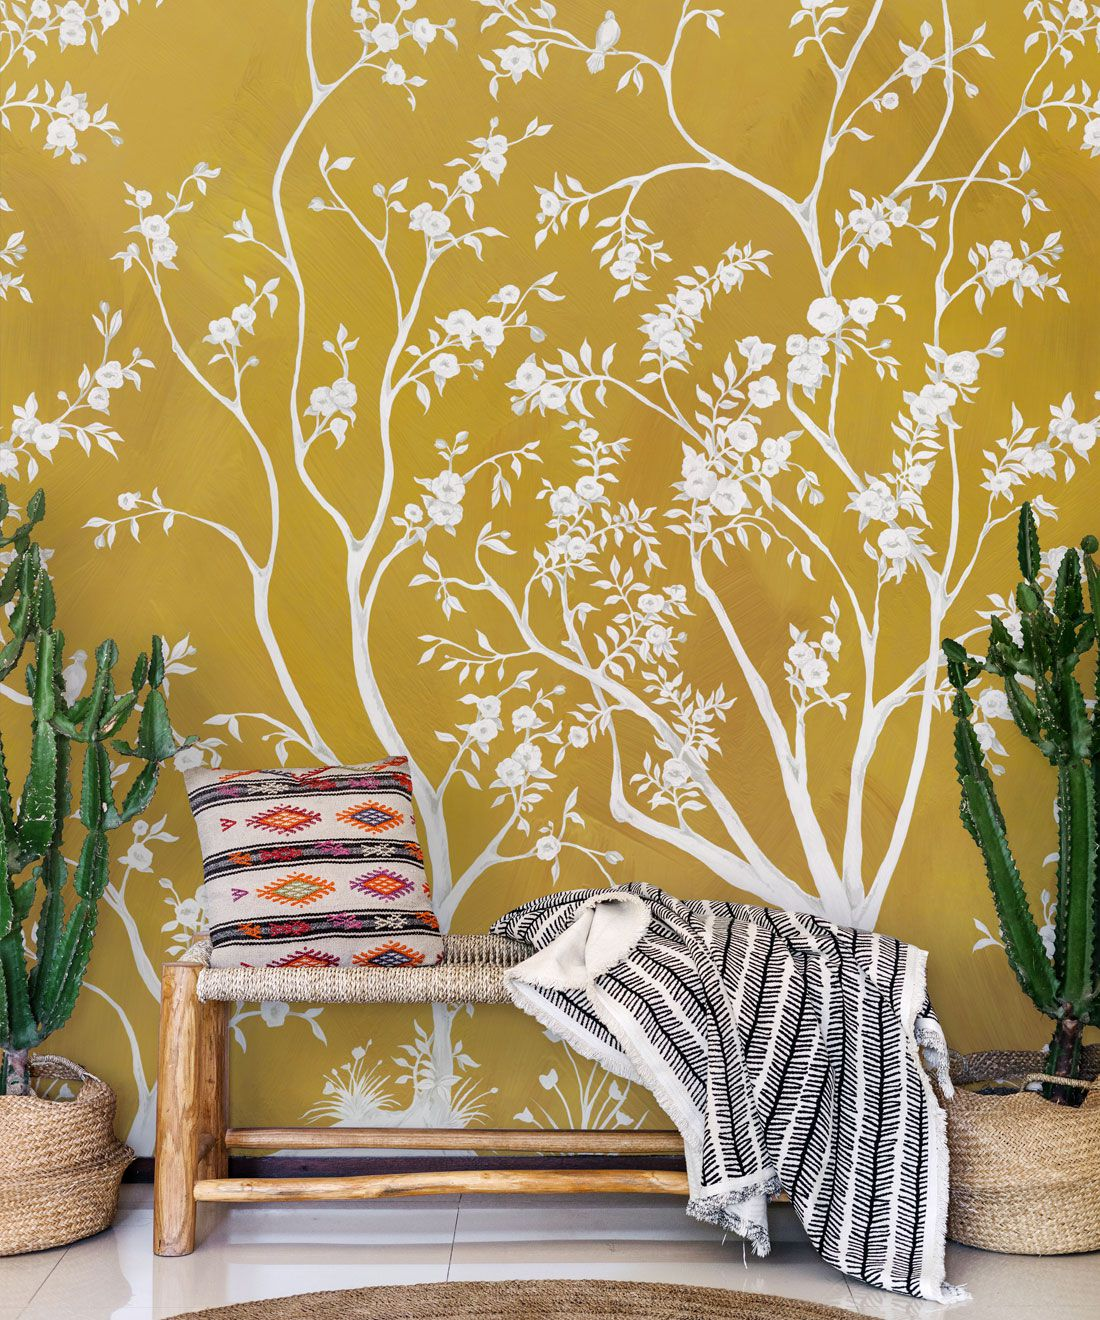 Blooming Joy • Chinoiserie Wallpaper by Danica Andler • Mustard Insitu